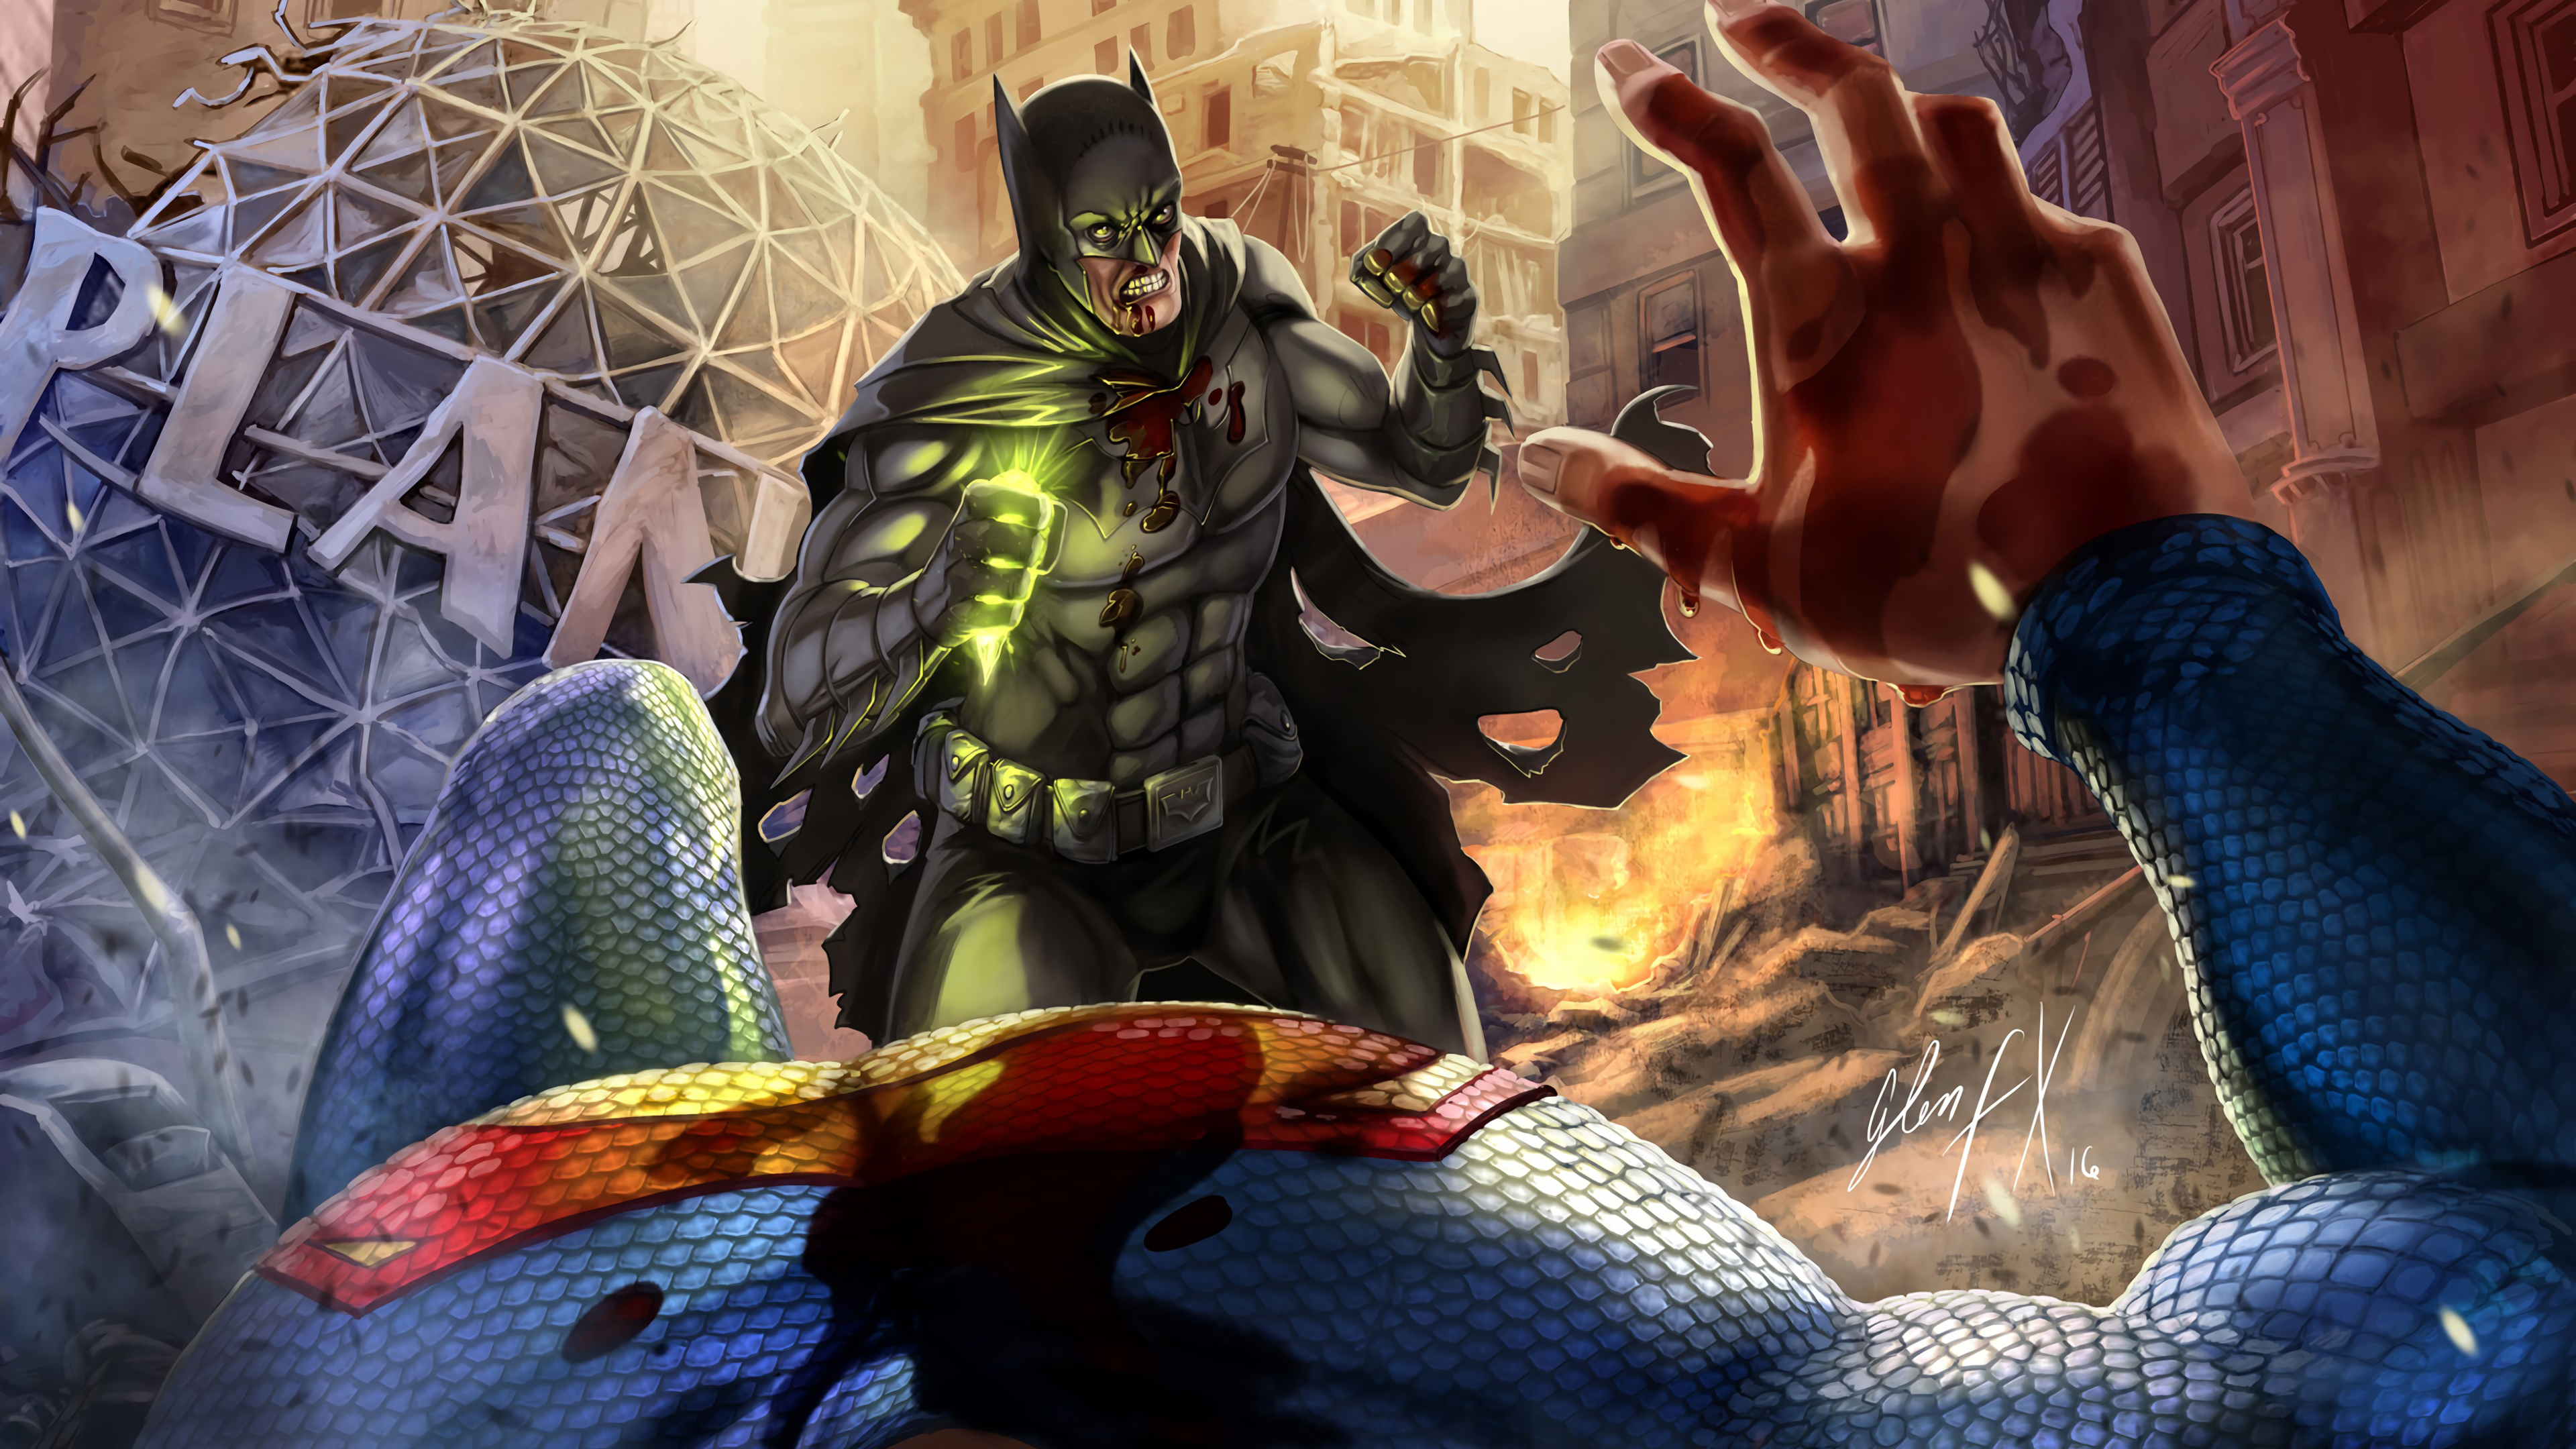 batman killed superman 1568054608 - Batman Killed Superman - superman wallpapers, superheroes wallpapers, hd-wallpapers, digital art wallpapers, batman wallpapers, artwork wallpapers, 4k-wallpapers